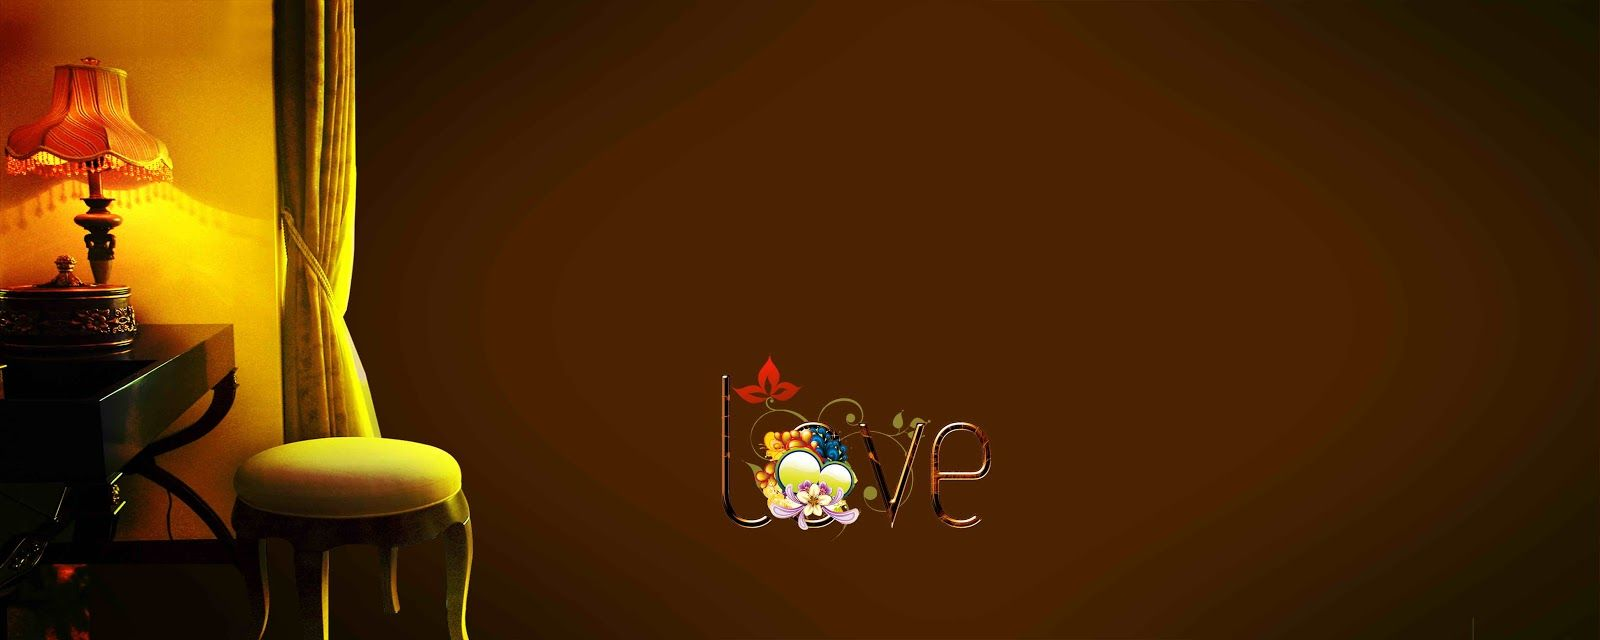 Abstract Background Vectors Photos And Psd Files Free Download Desain Latar Belakang Desainer Grafis Abstrak